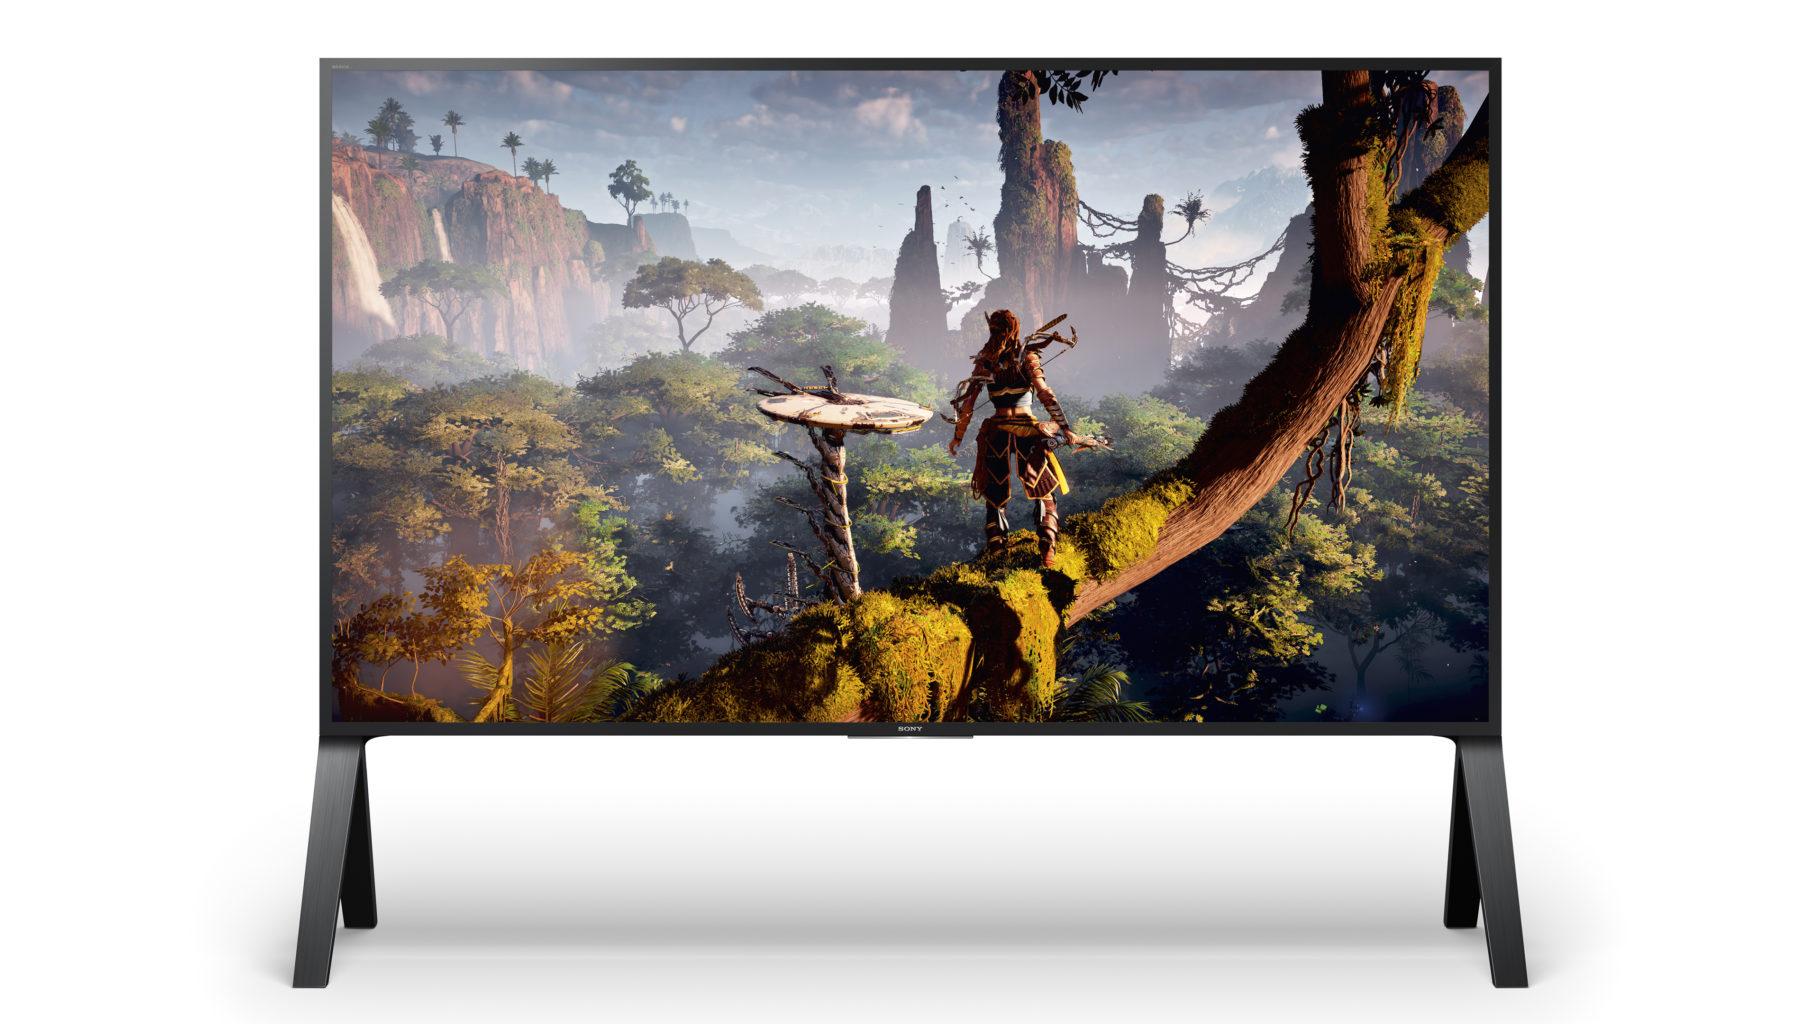 Le nuove TV 4K HDR di Sony